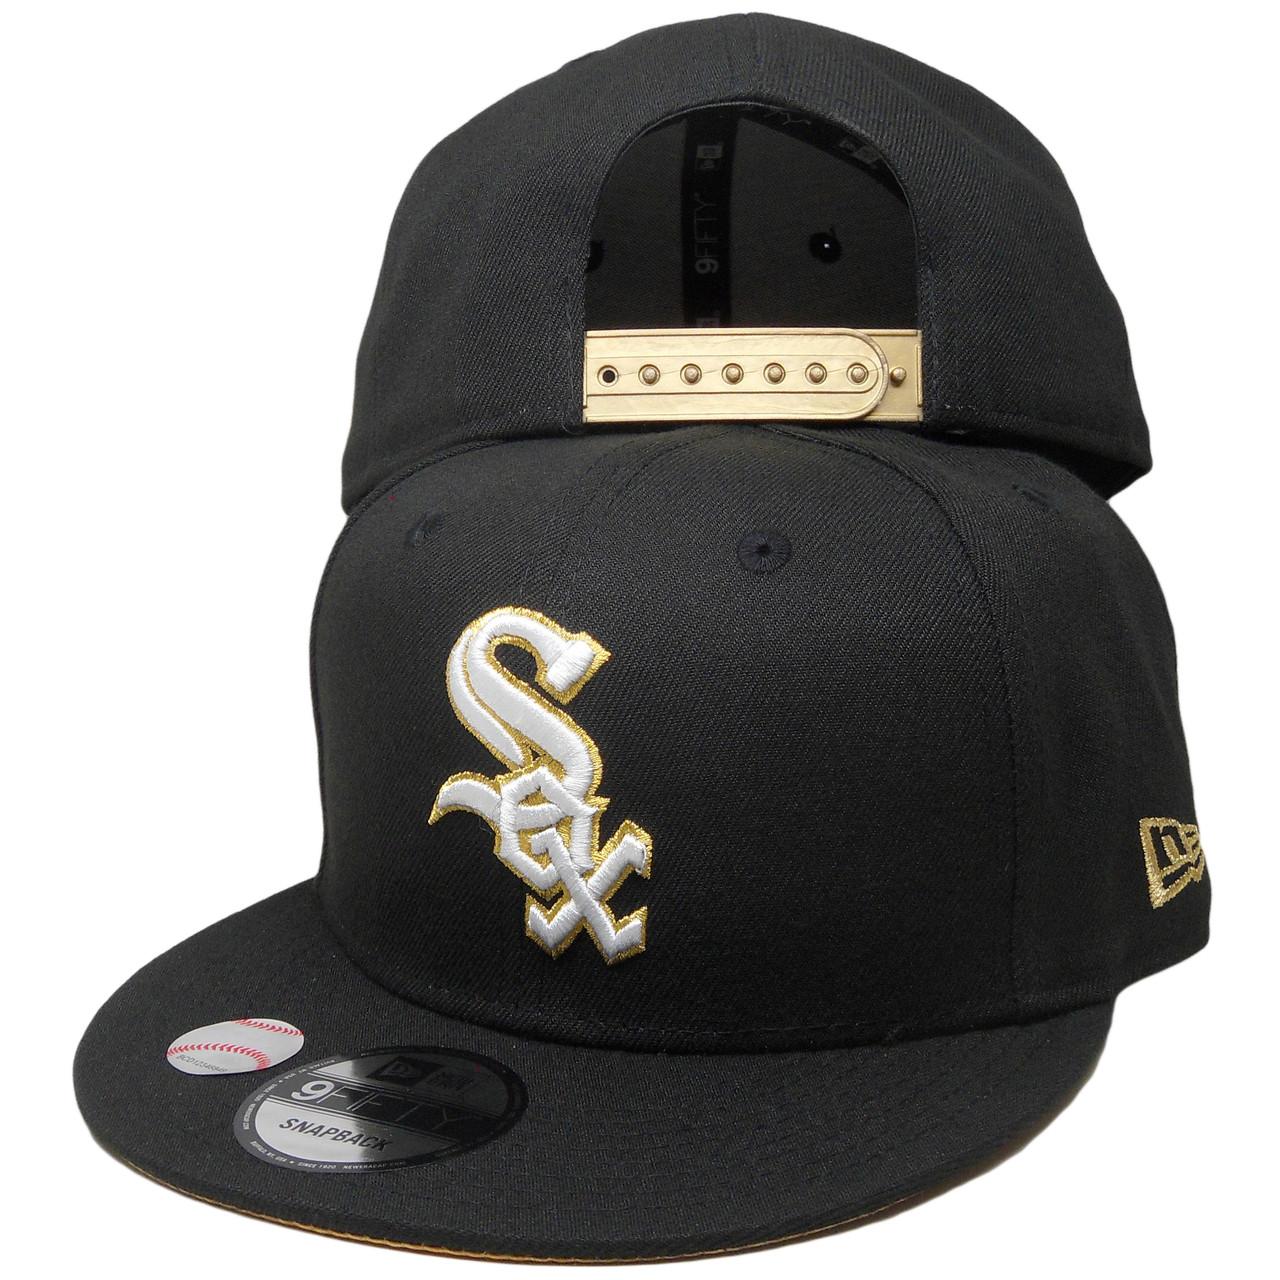 32337735 Chicago White Sox New Era Tribute Flip 9Fifty Snapback - Black, White, Gold  - ECapsUnlimited.com